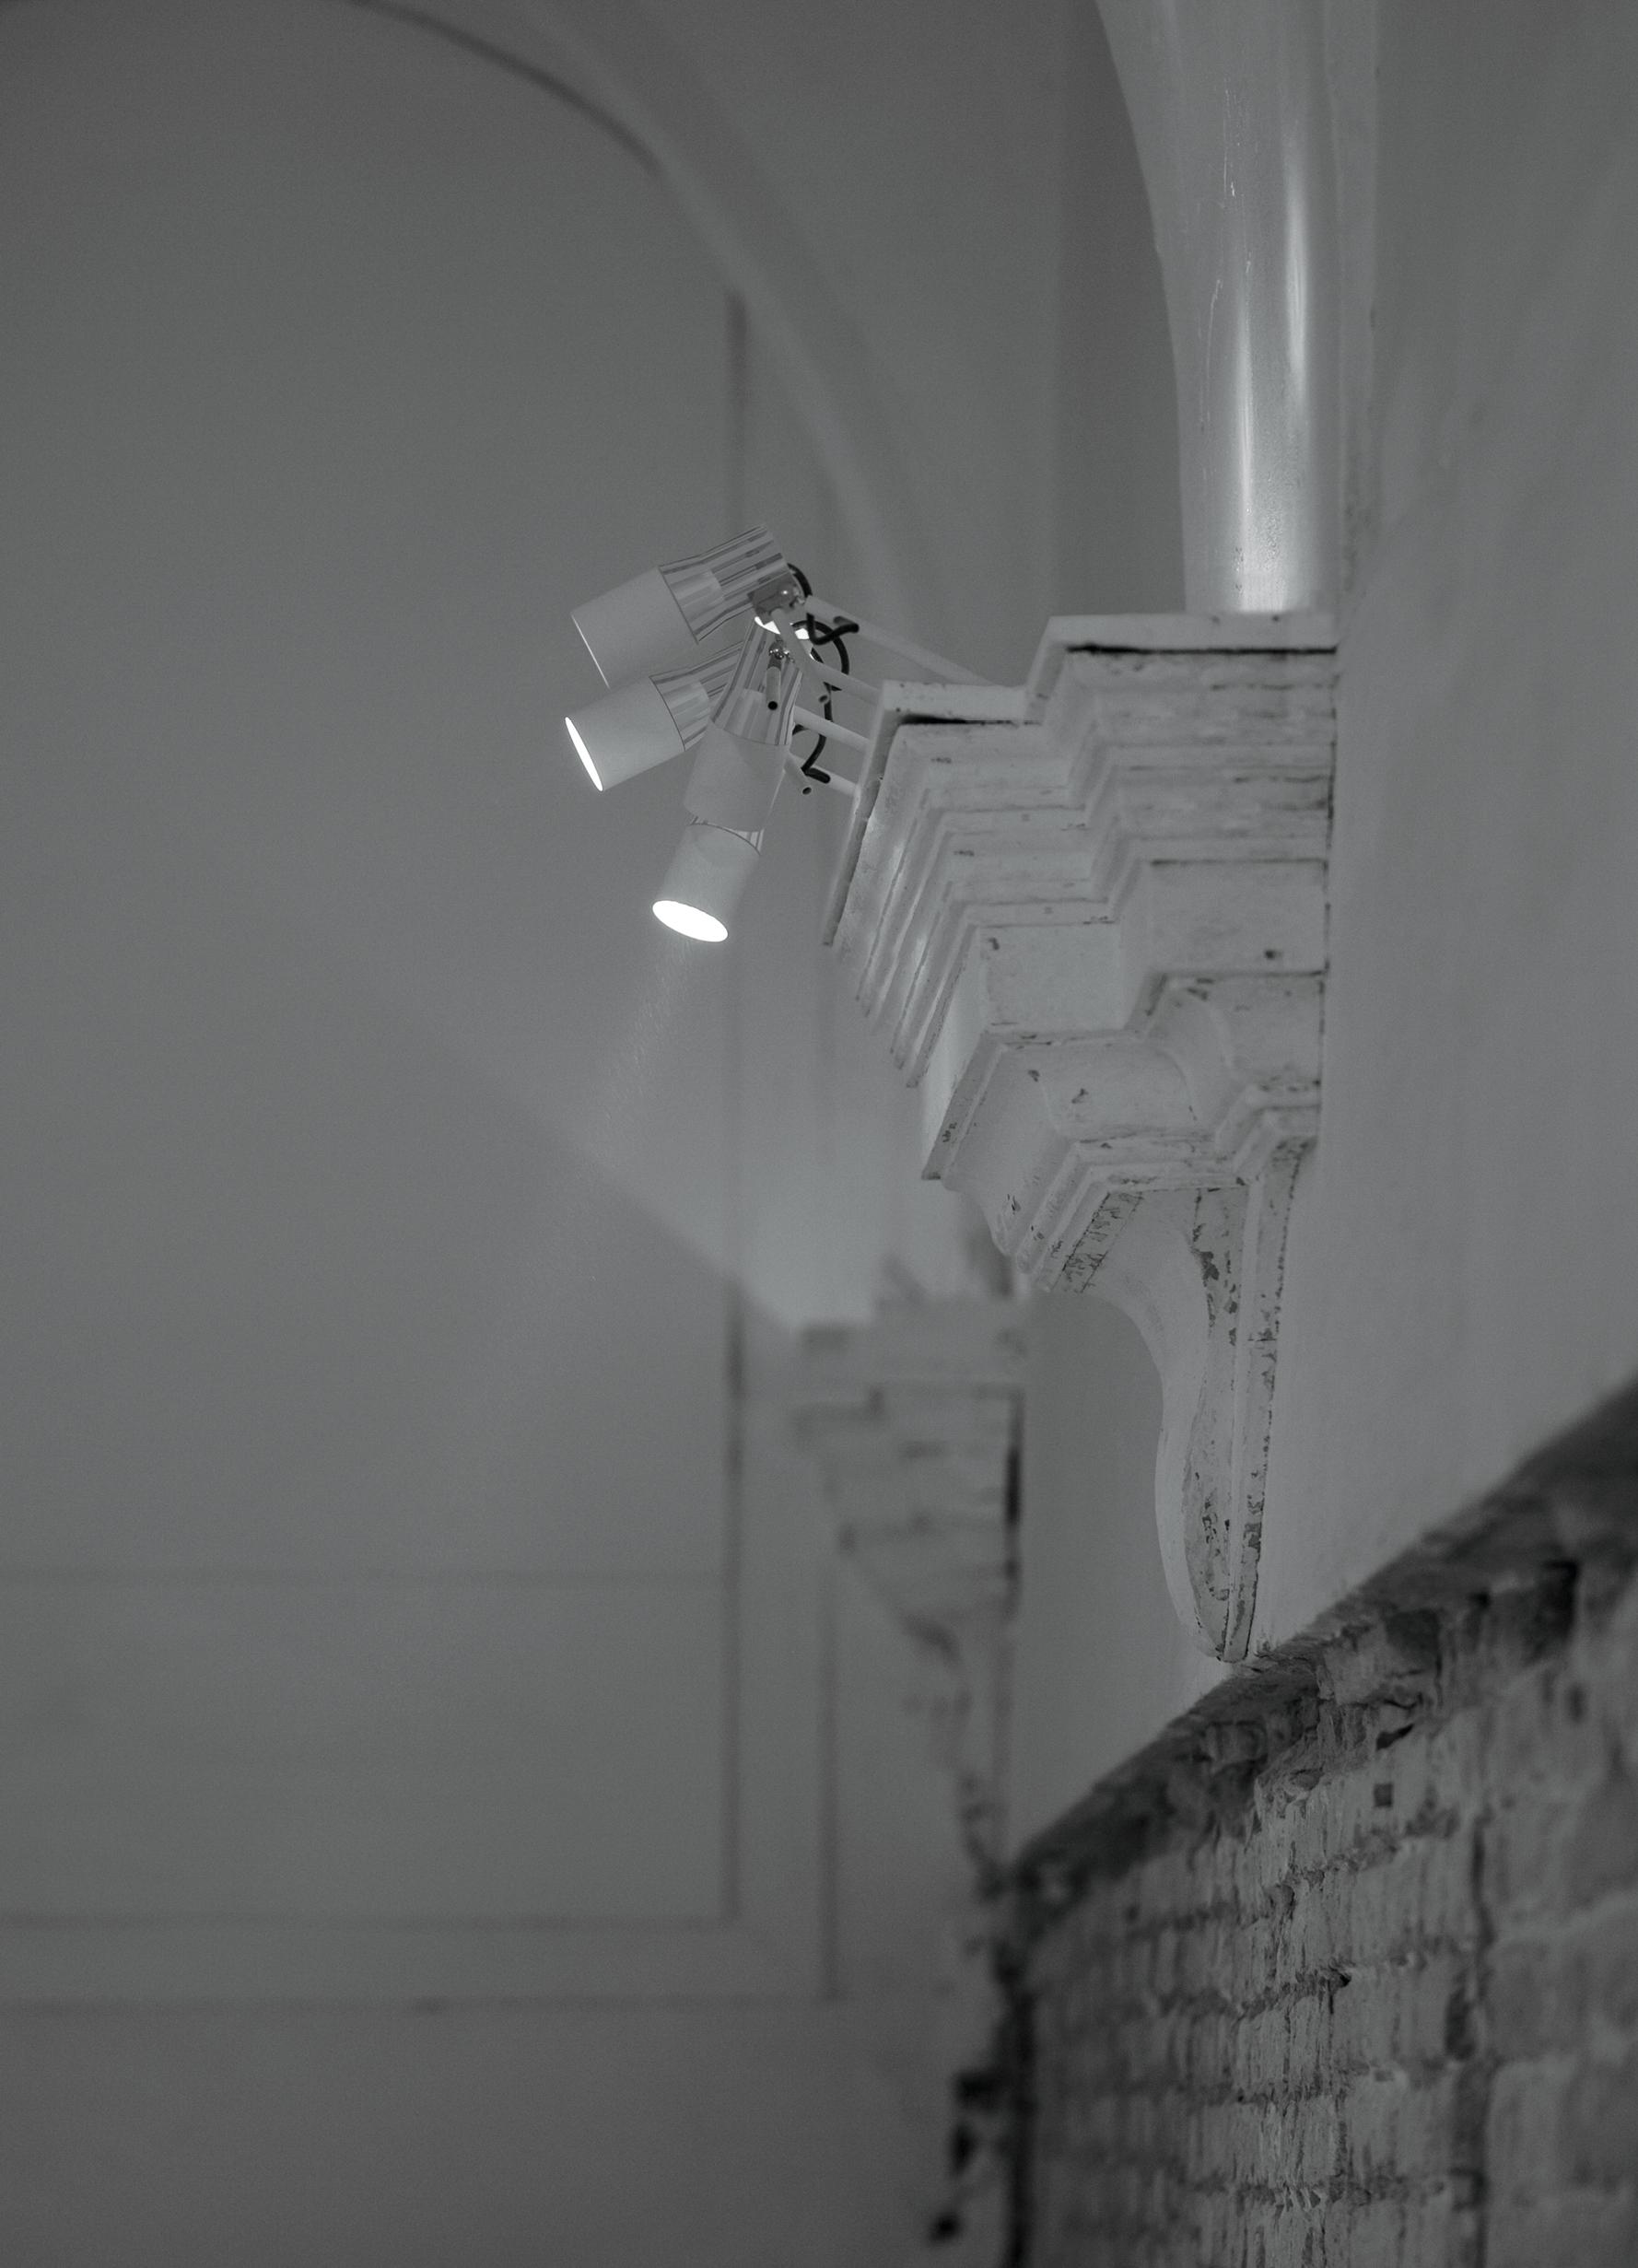 dca parete soffitto_img2